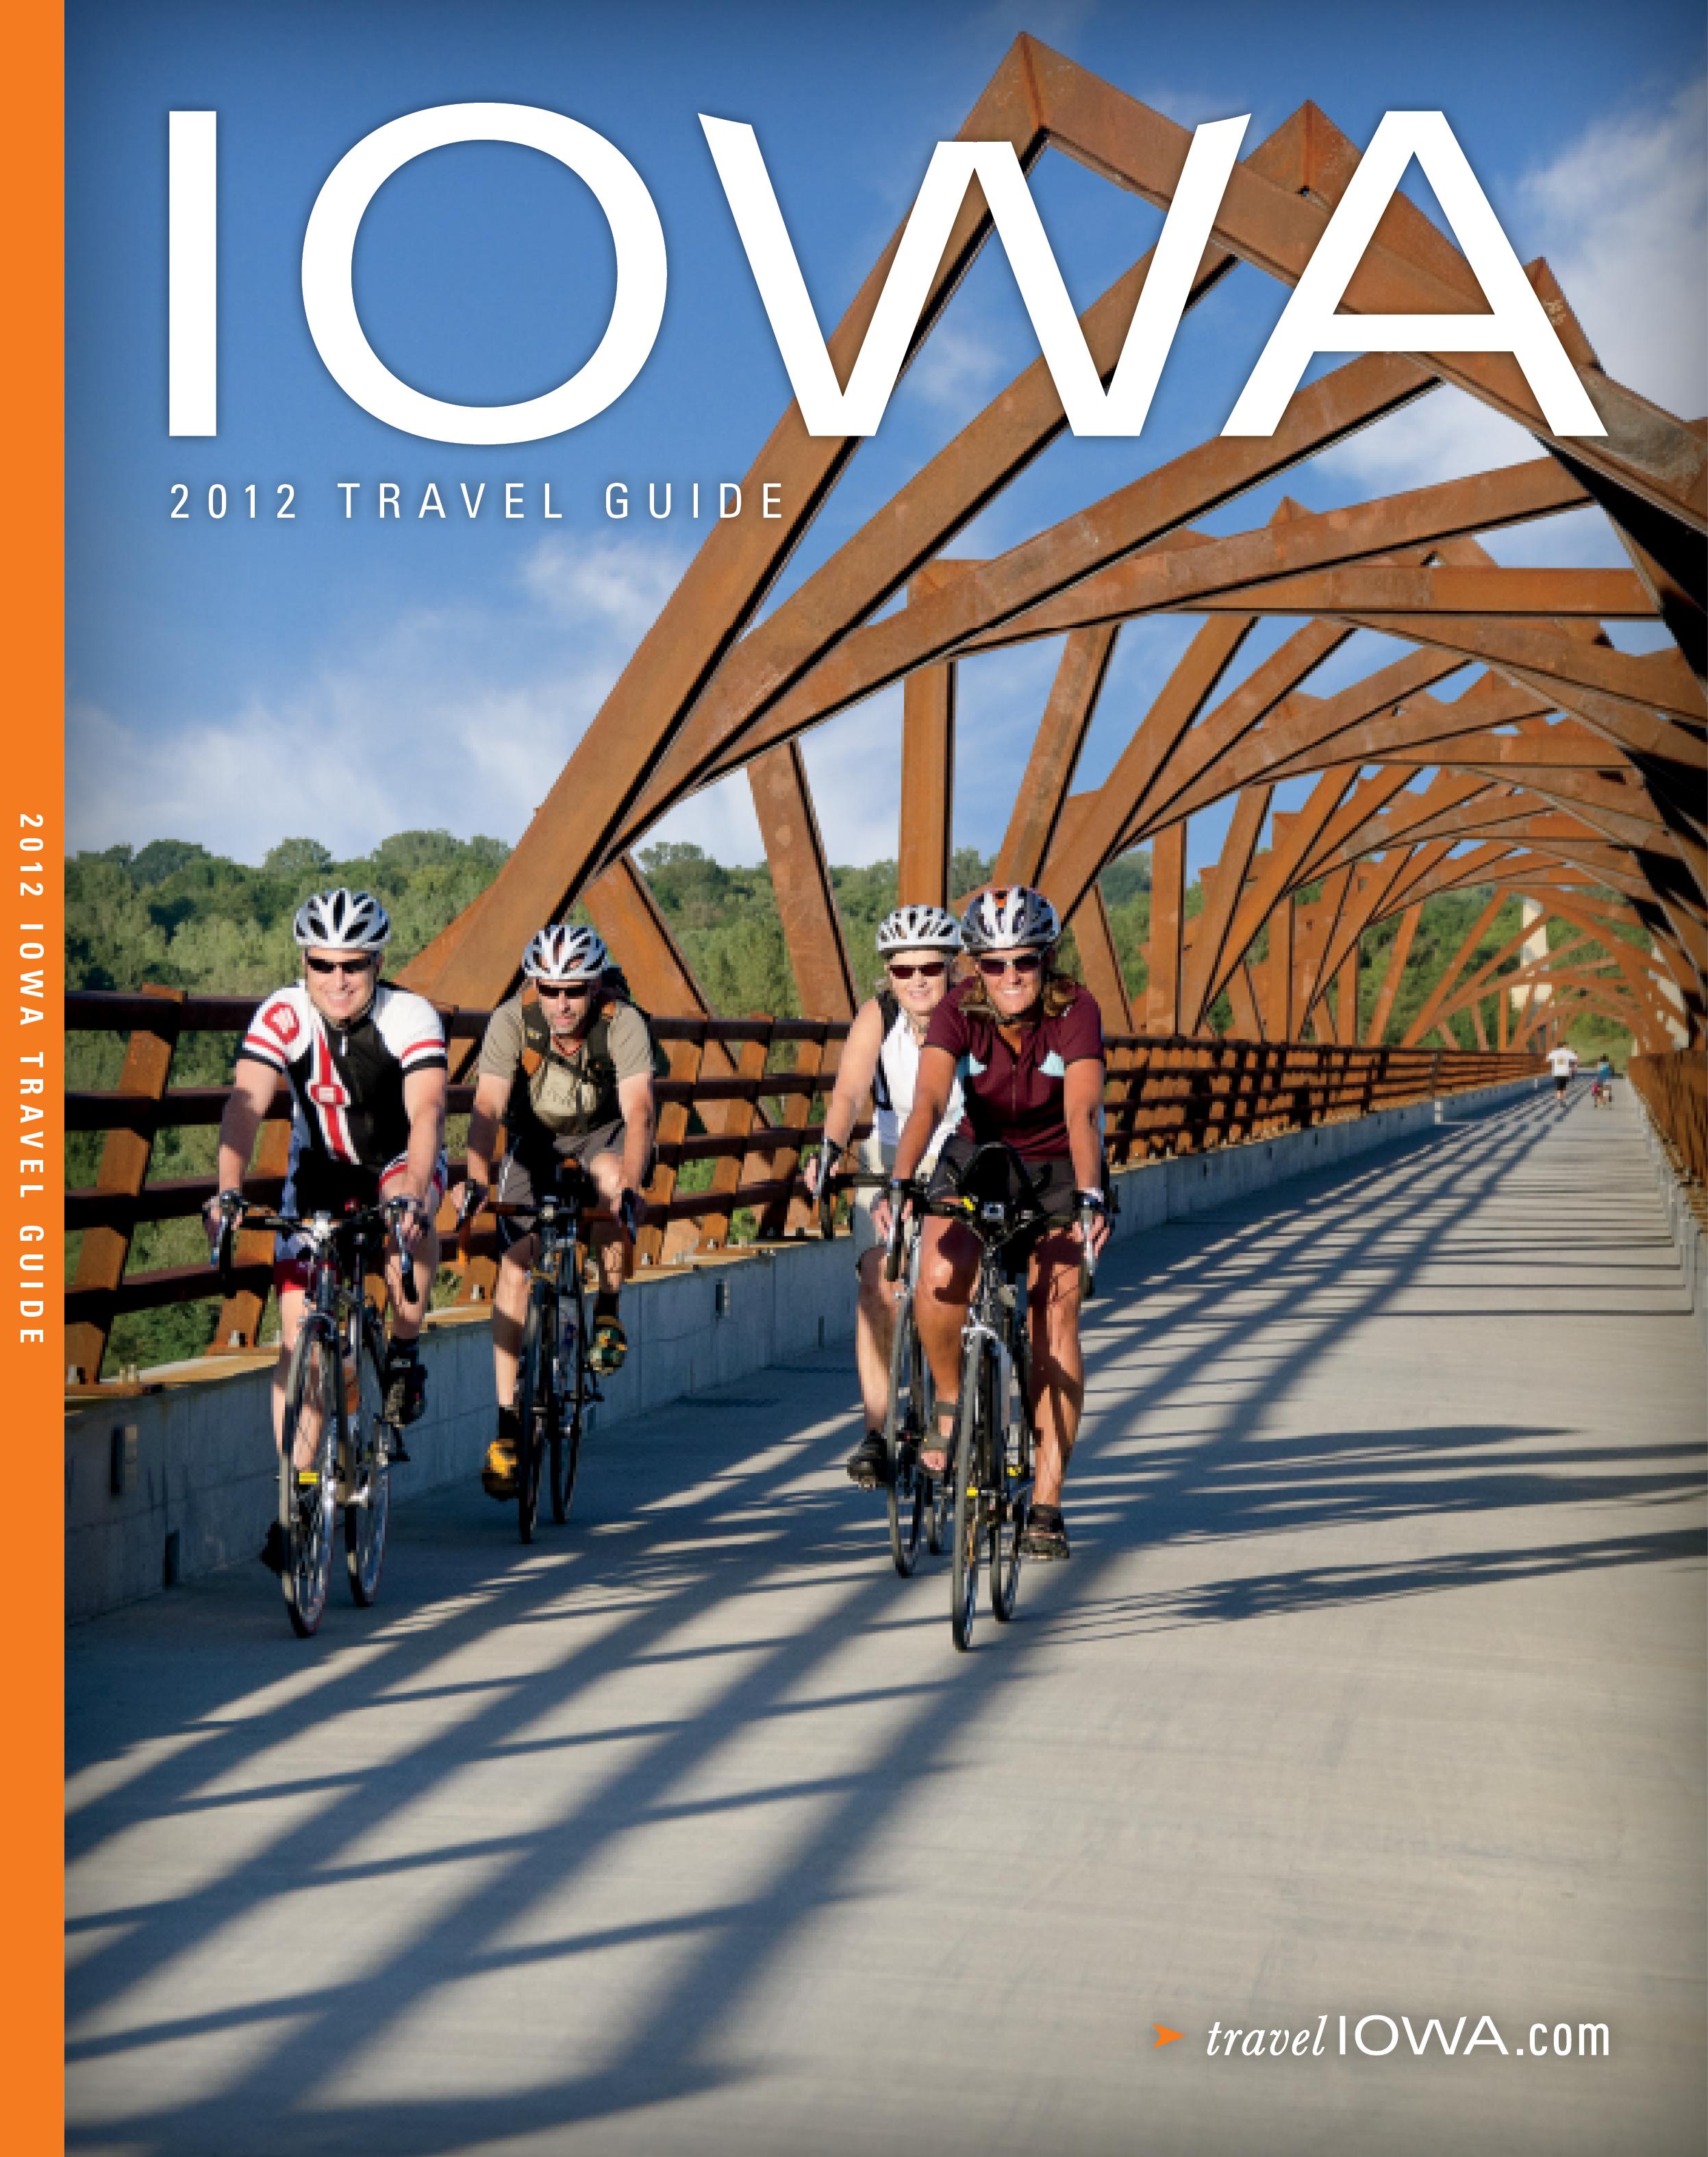 Photo contest to determine 2013 Iowa Travel Guide cover - Radio Iowa